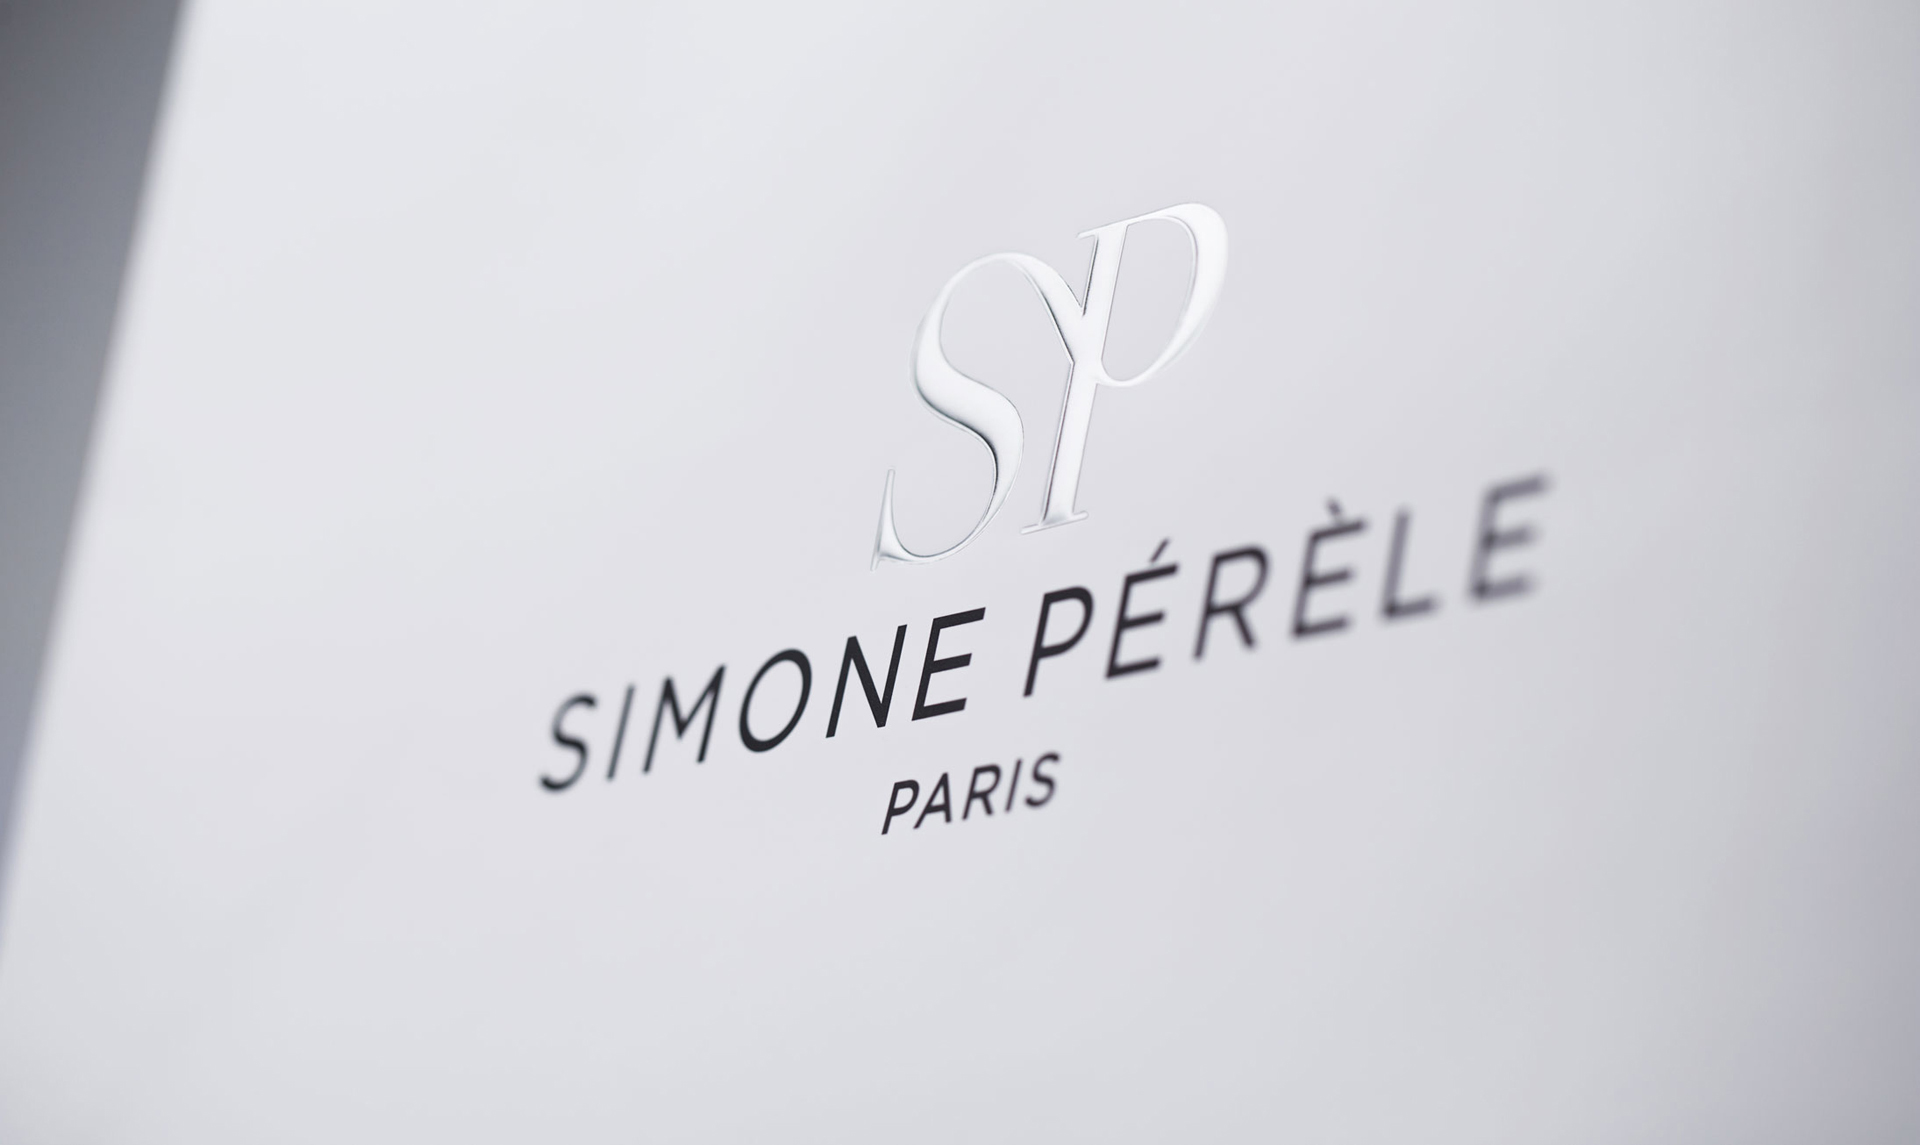 Simon Perele